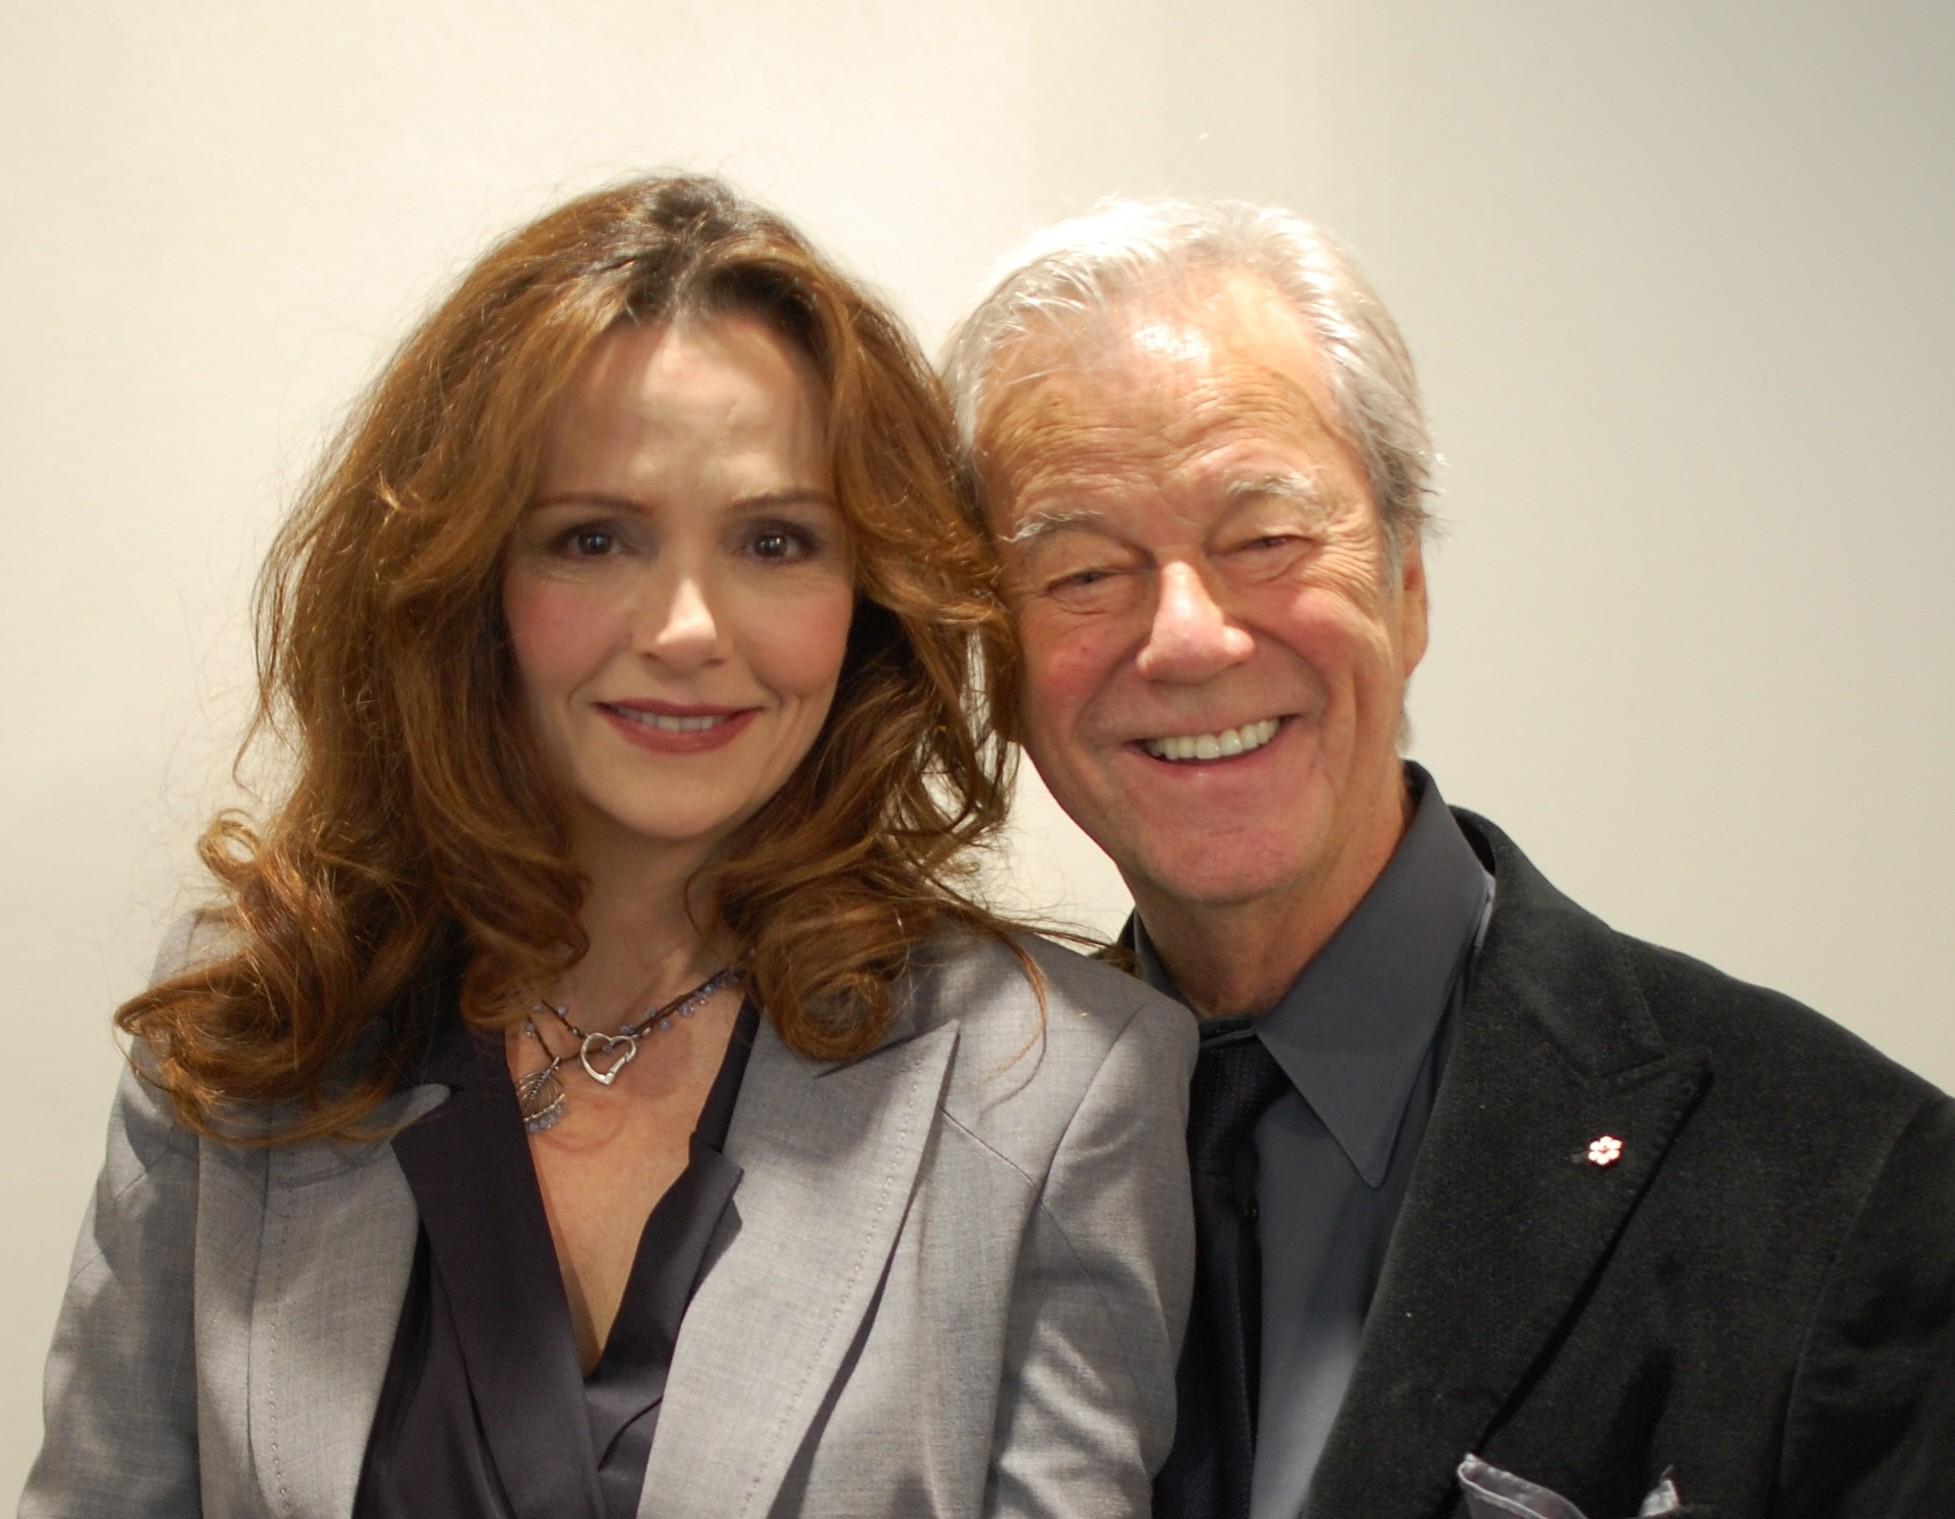 Jennifer Dale & Gordon Pinsent